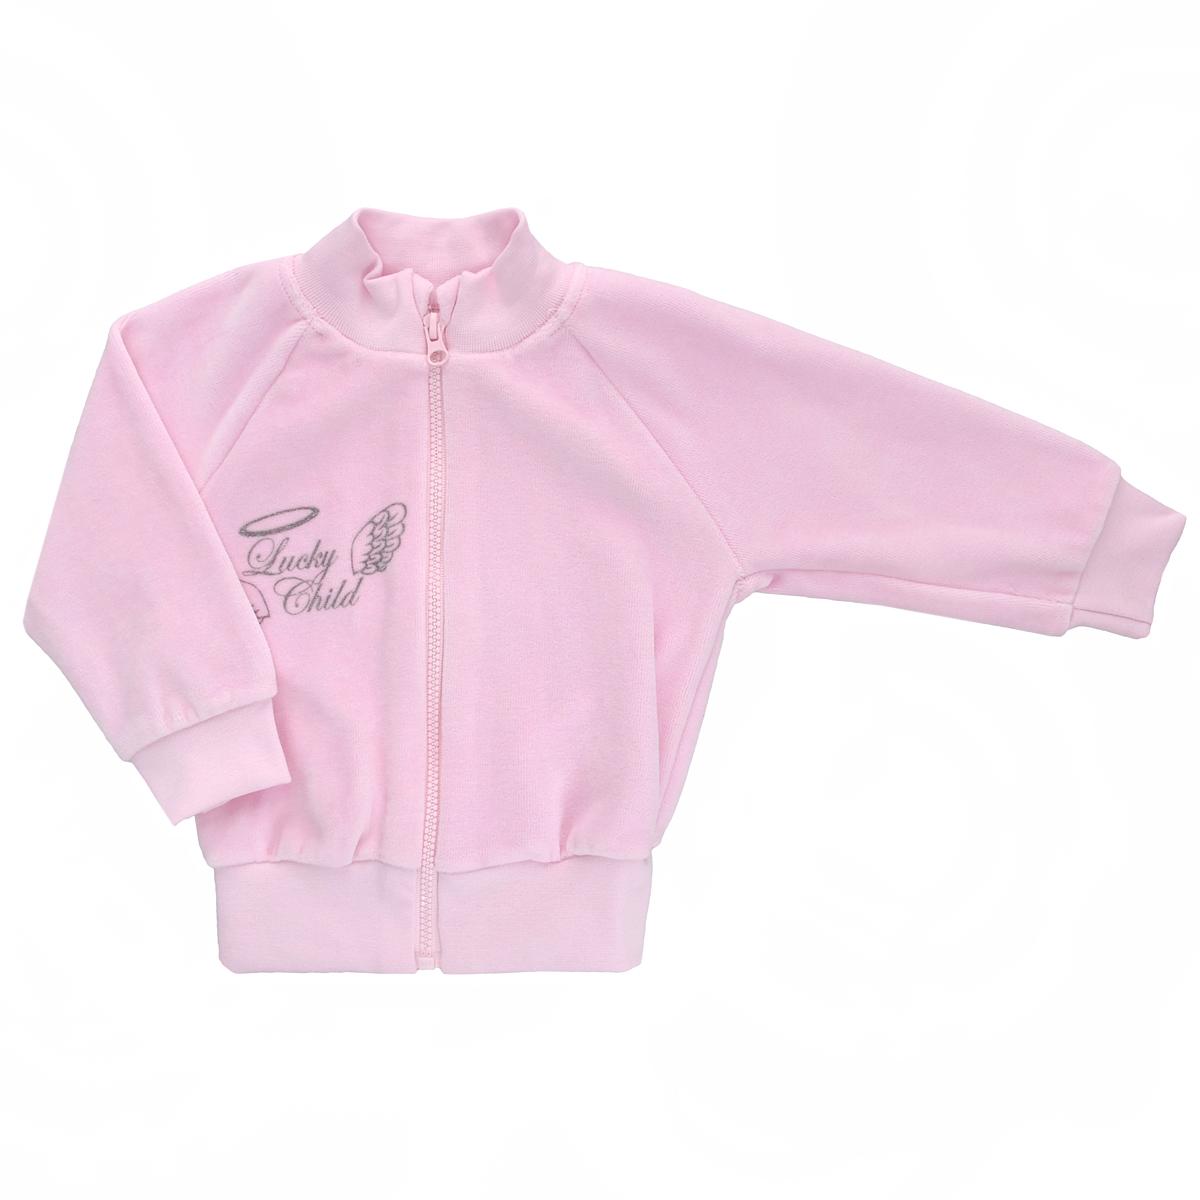 Кофточка детская Lucky Child Ангелы, цвет: розовый. 17-18. Размер 80/86